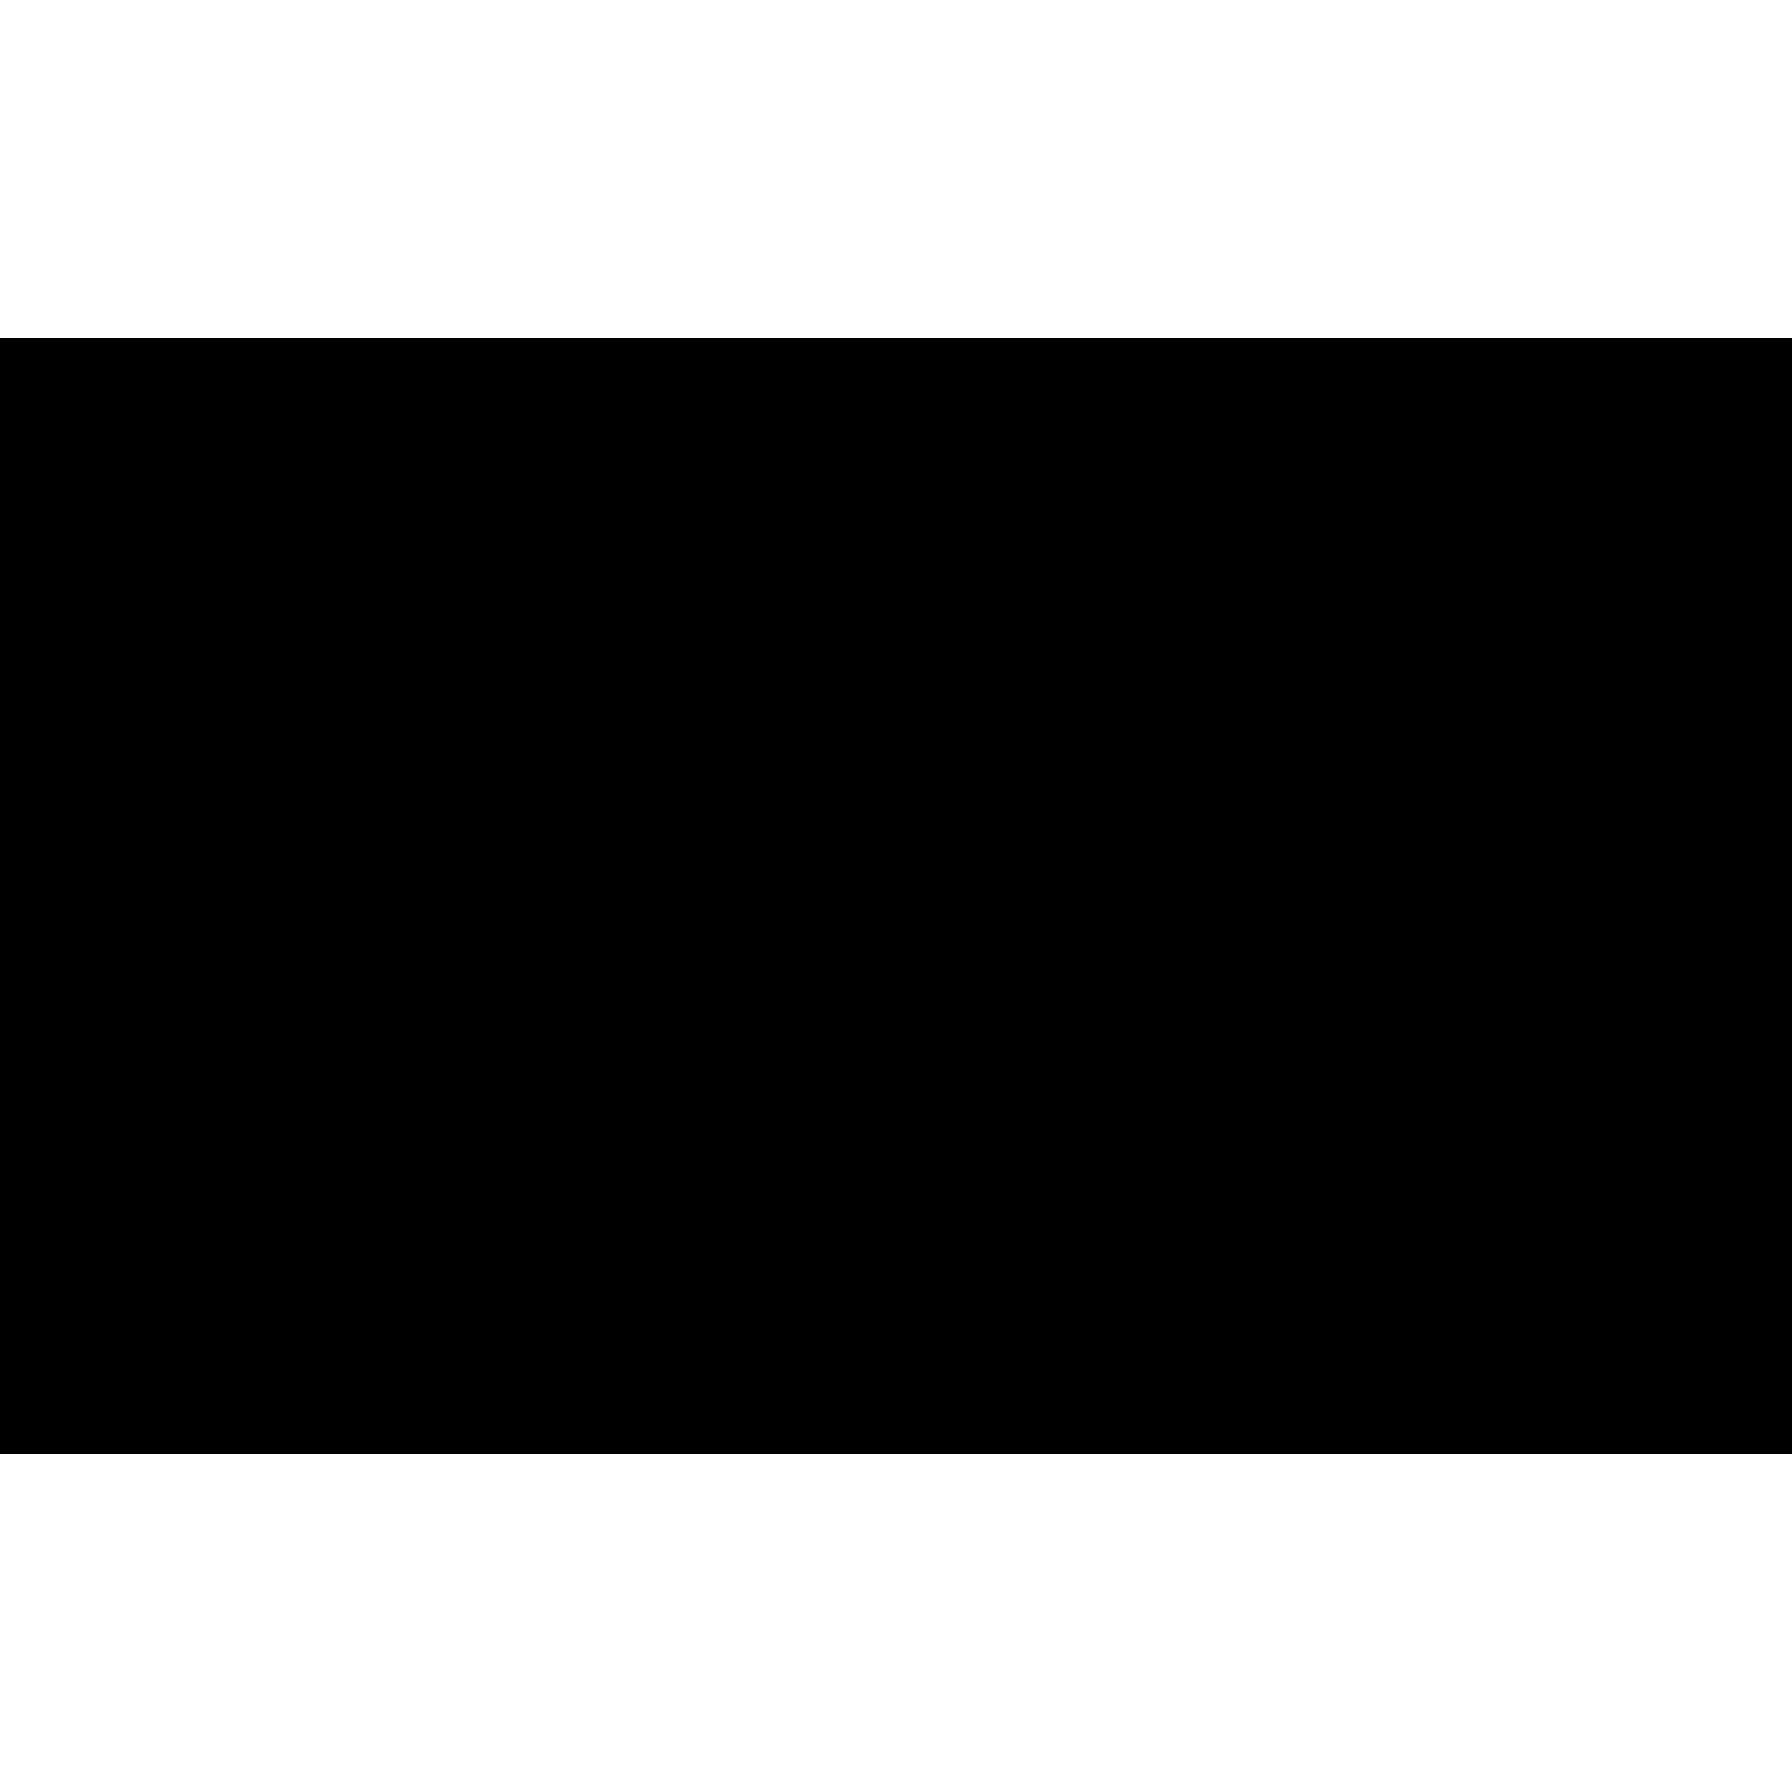 behance-logo_318-50602